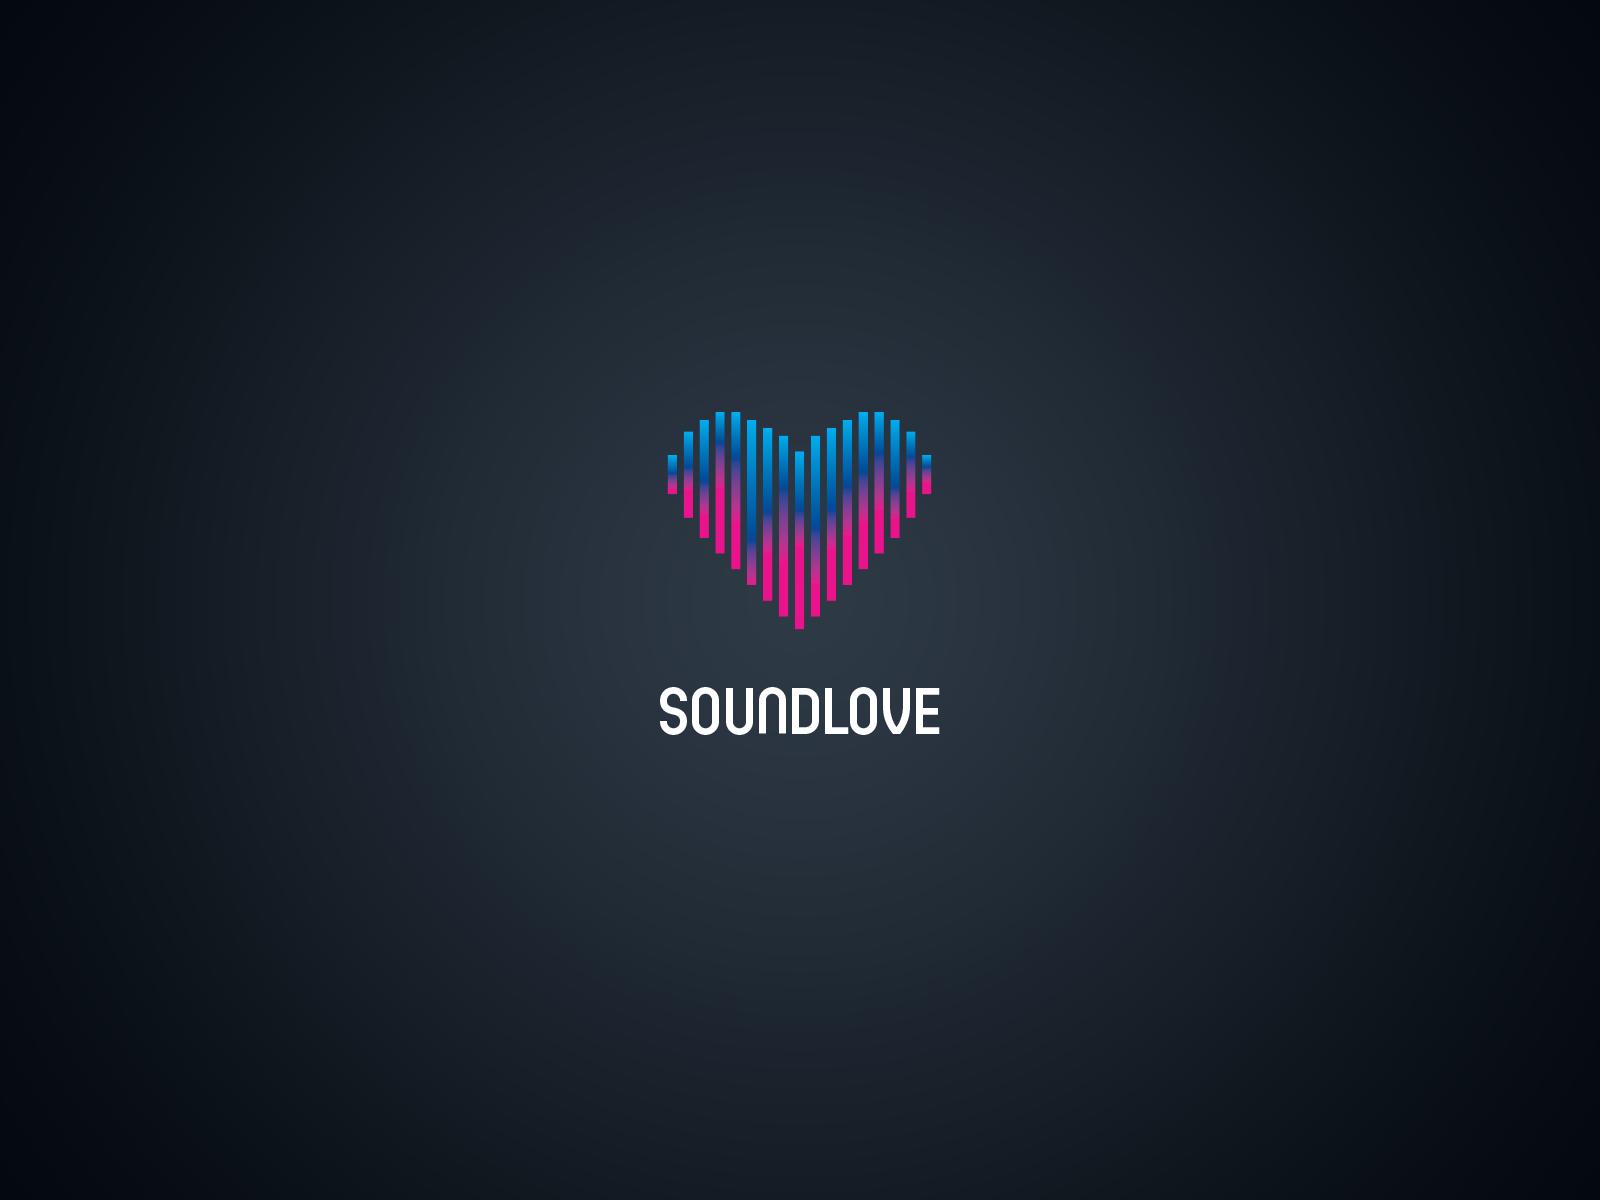 soundlove Logotype / concept